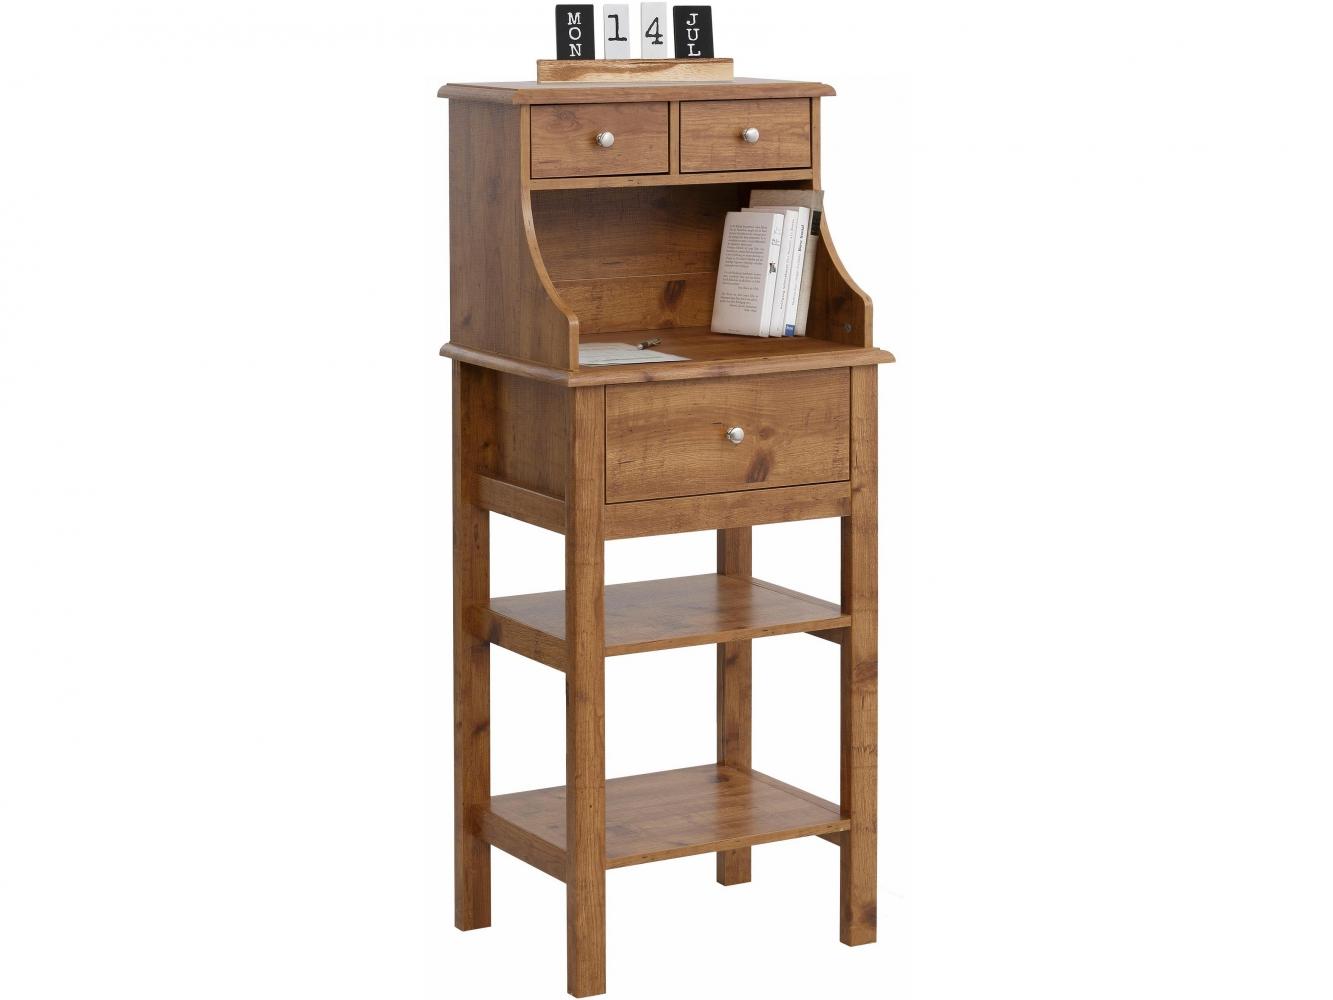 Konzolový stolek Keef, 130 cm, tmavý dub